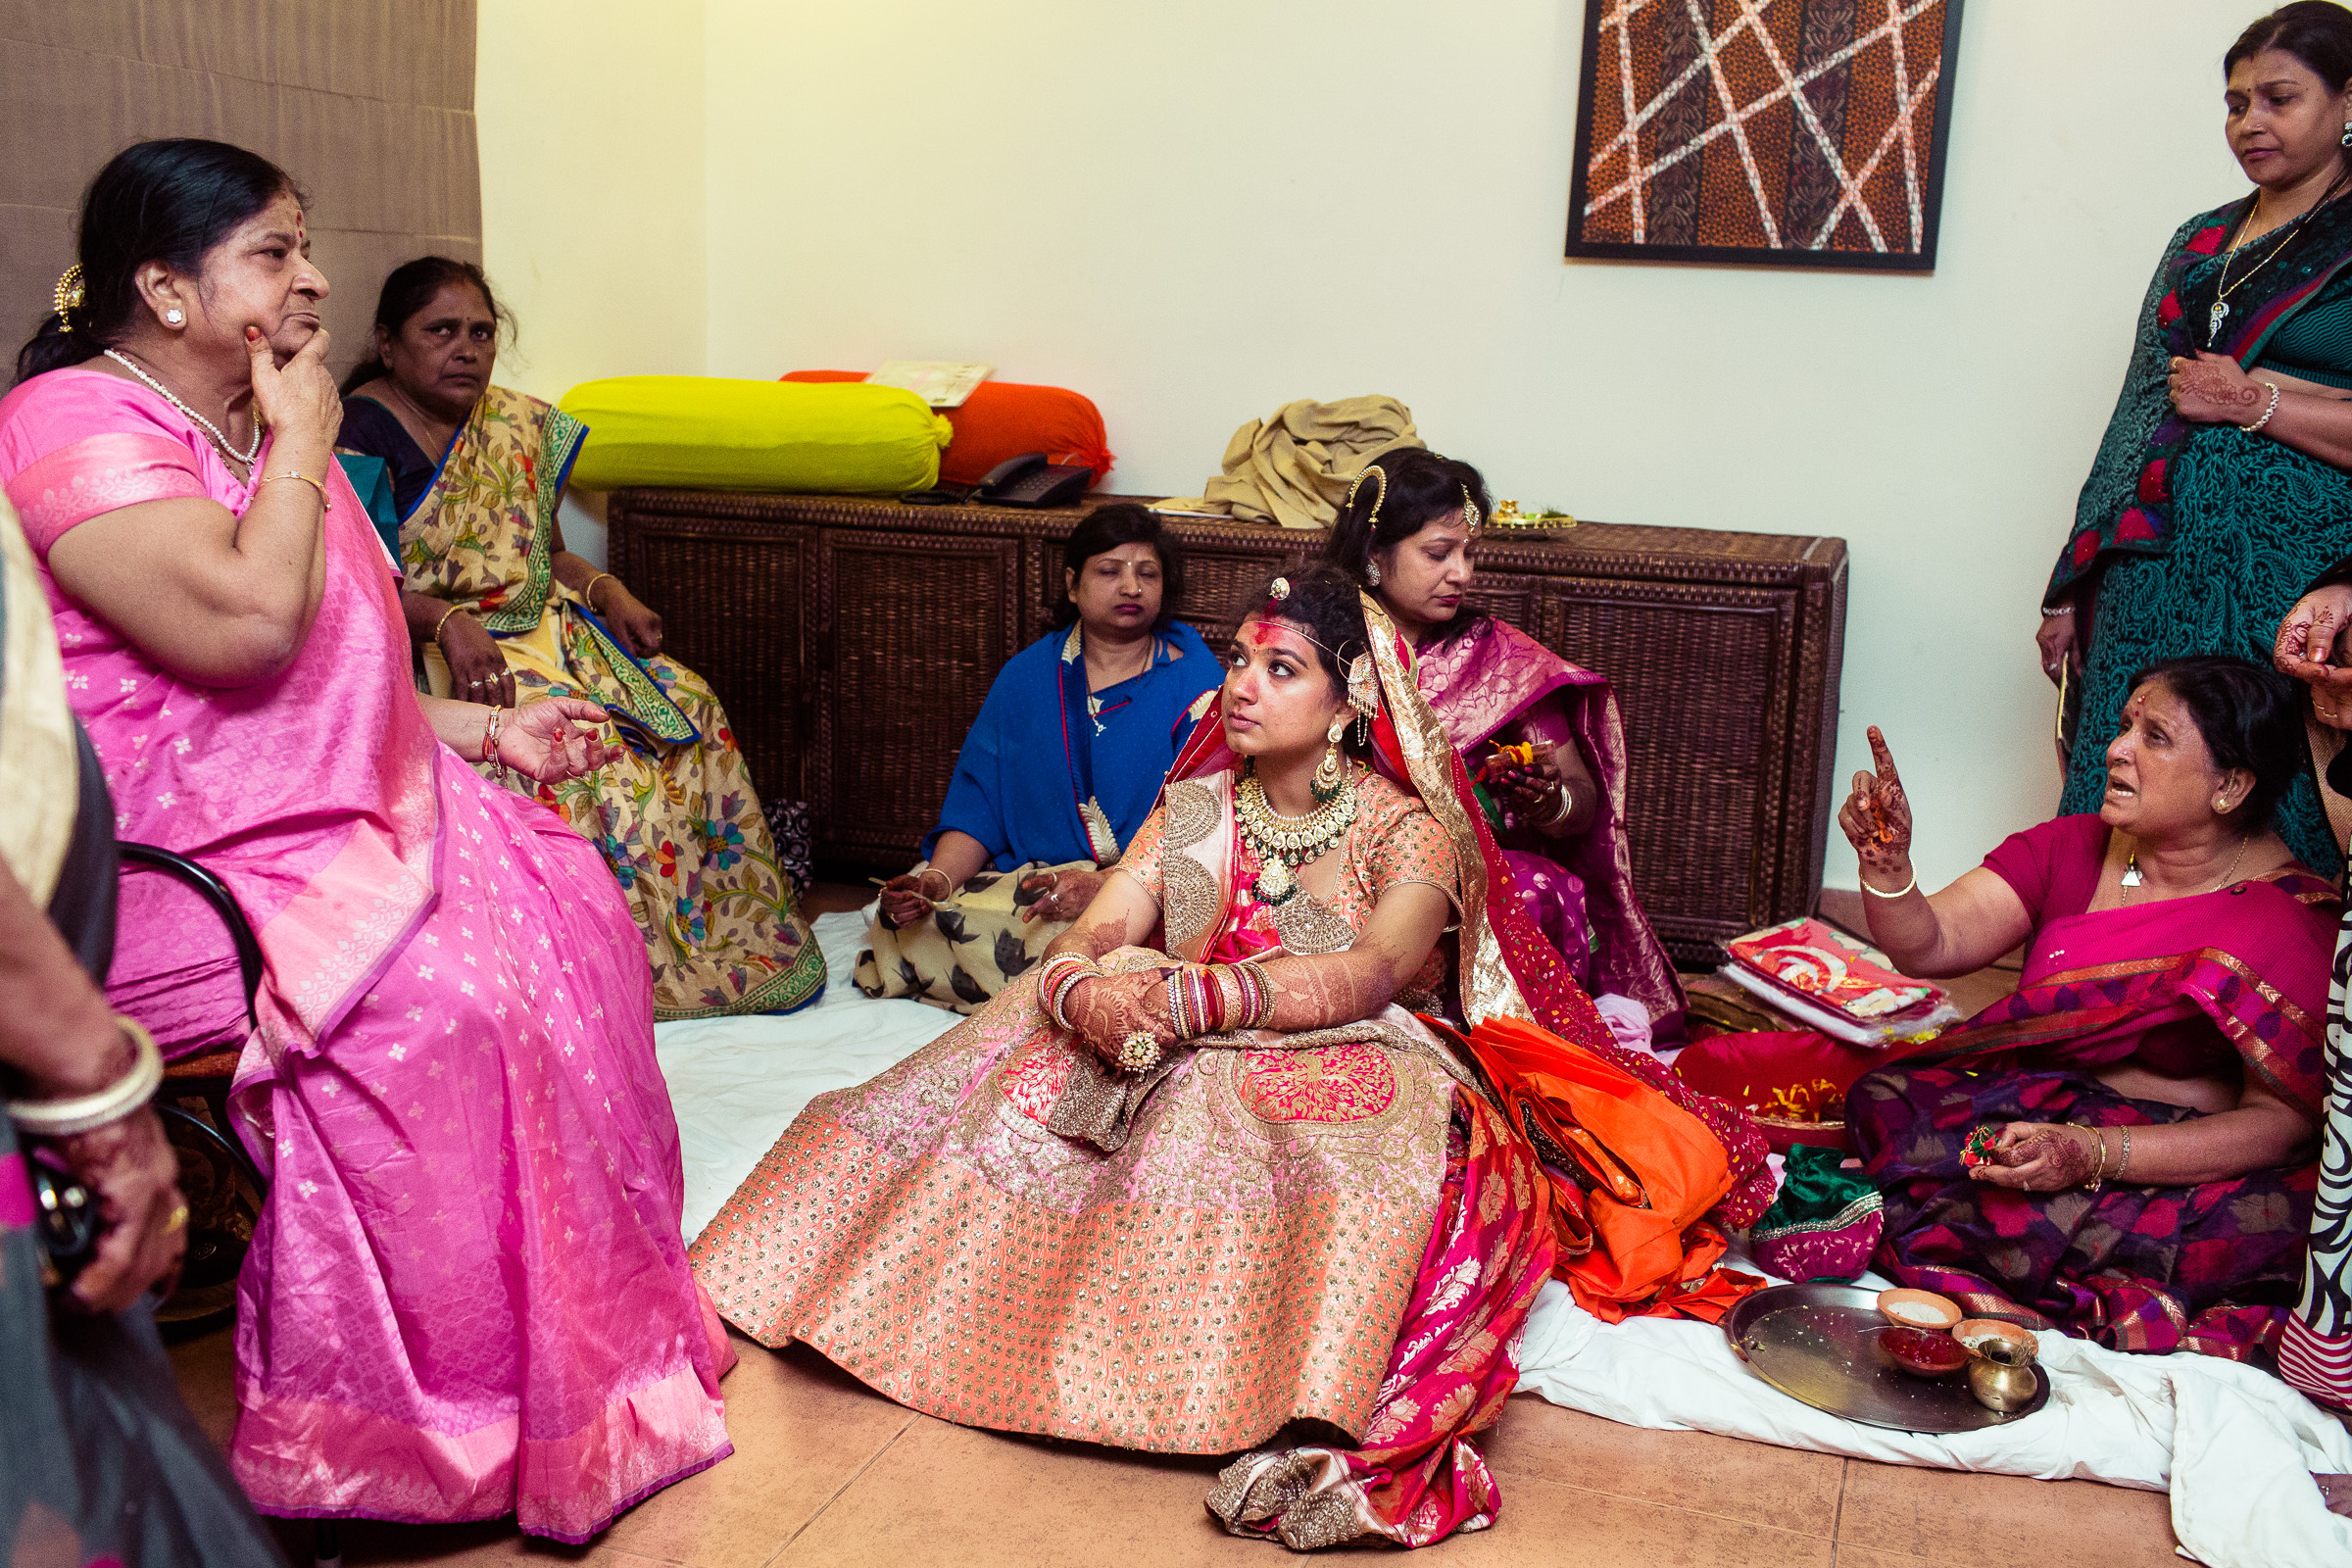 marwari-candid-wedding-photographers-bangalore-0059.jpg